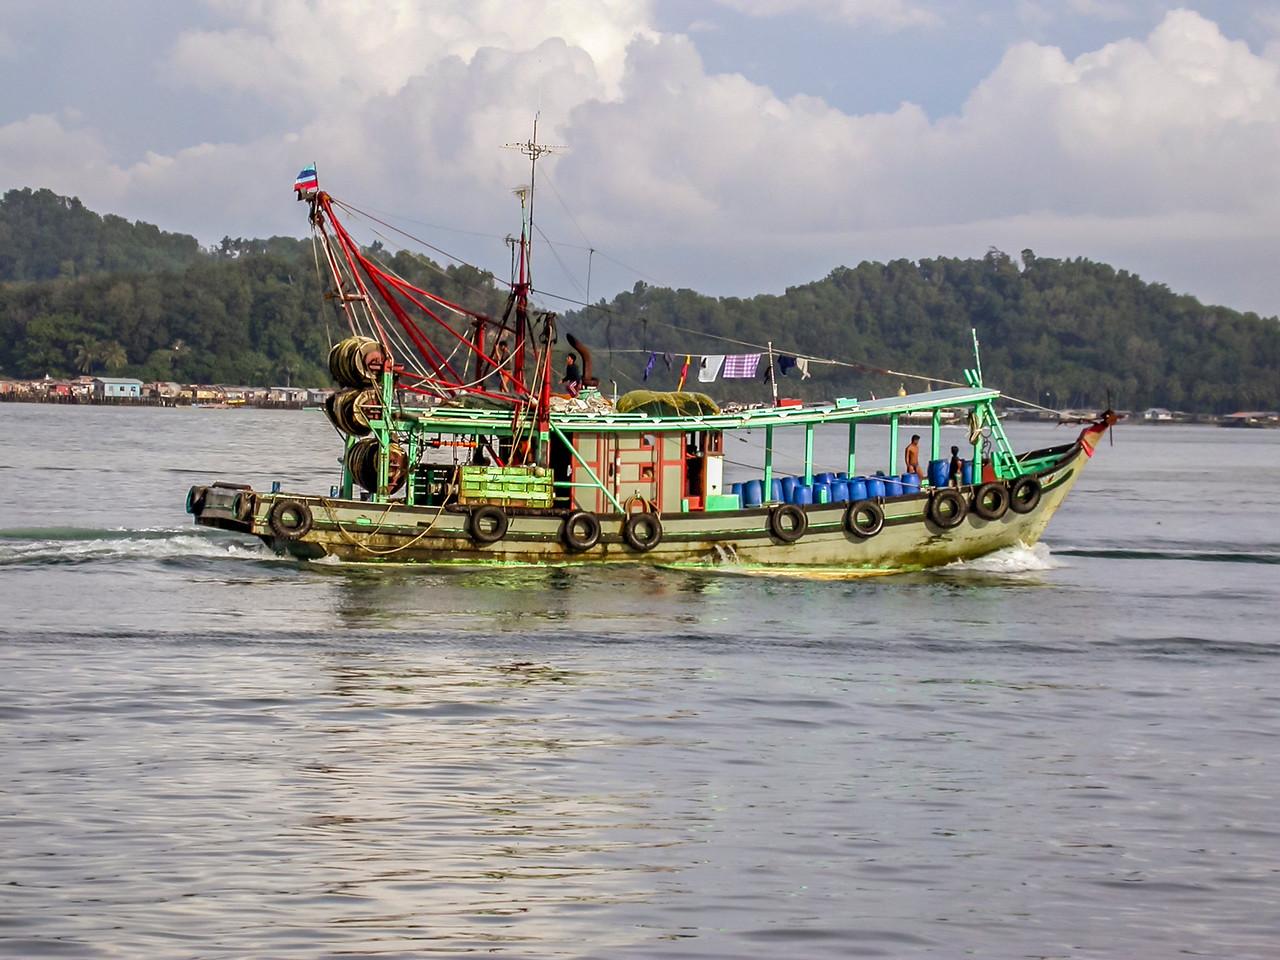 Kota Kinabalu, Borneo, Malaysia 2005